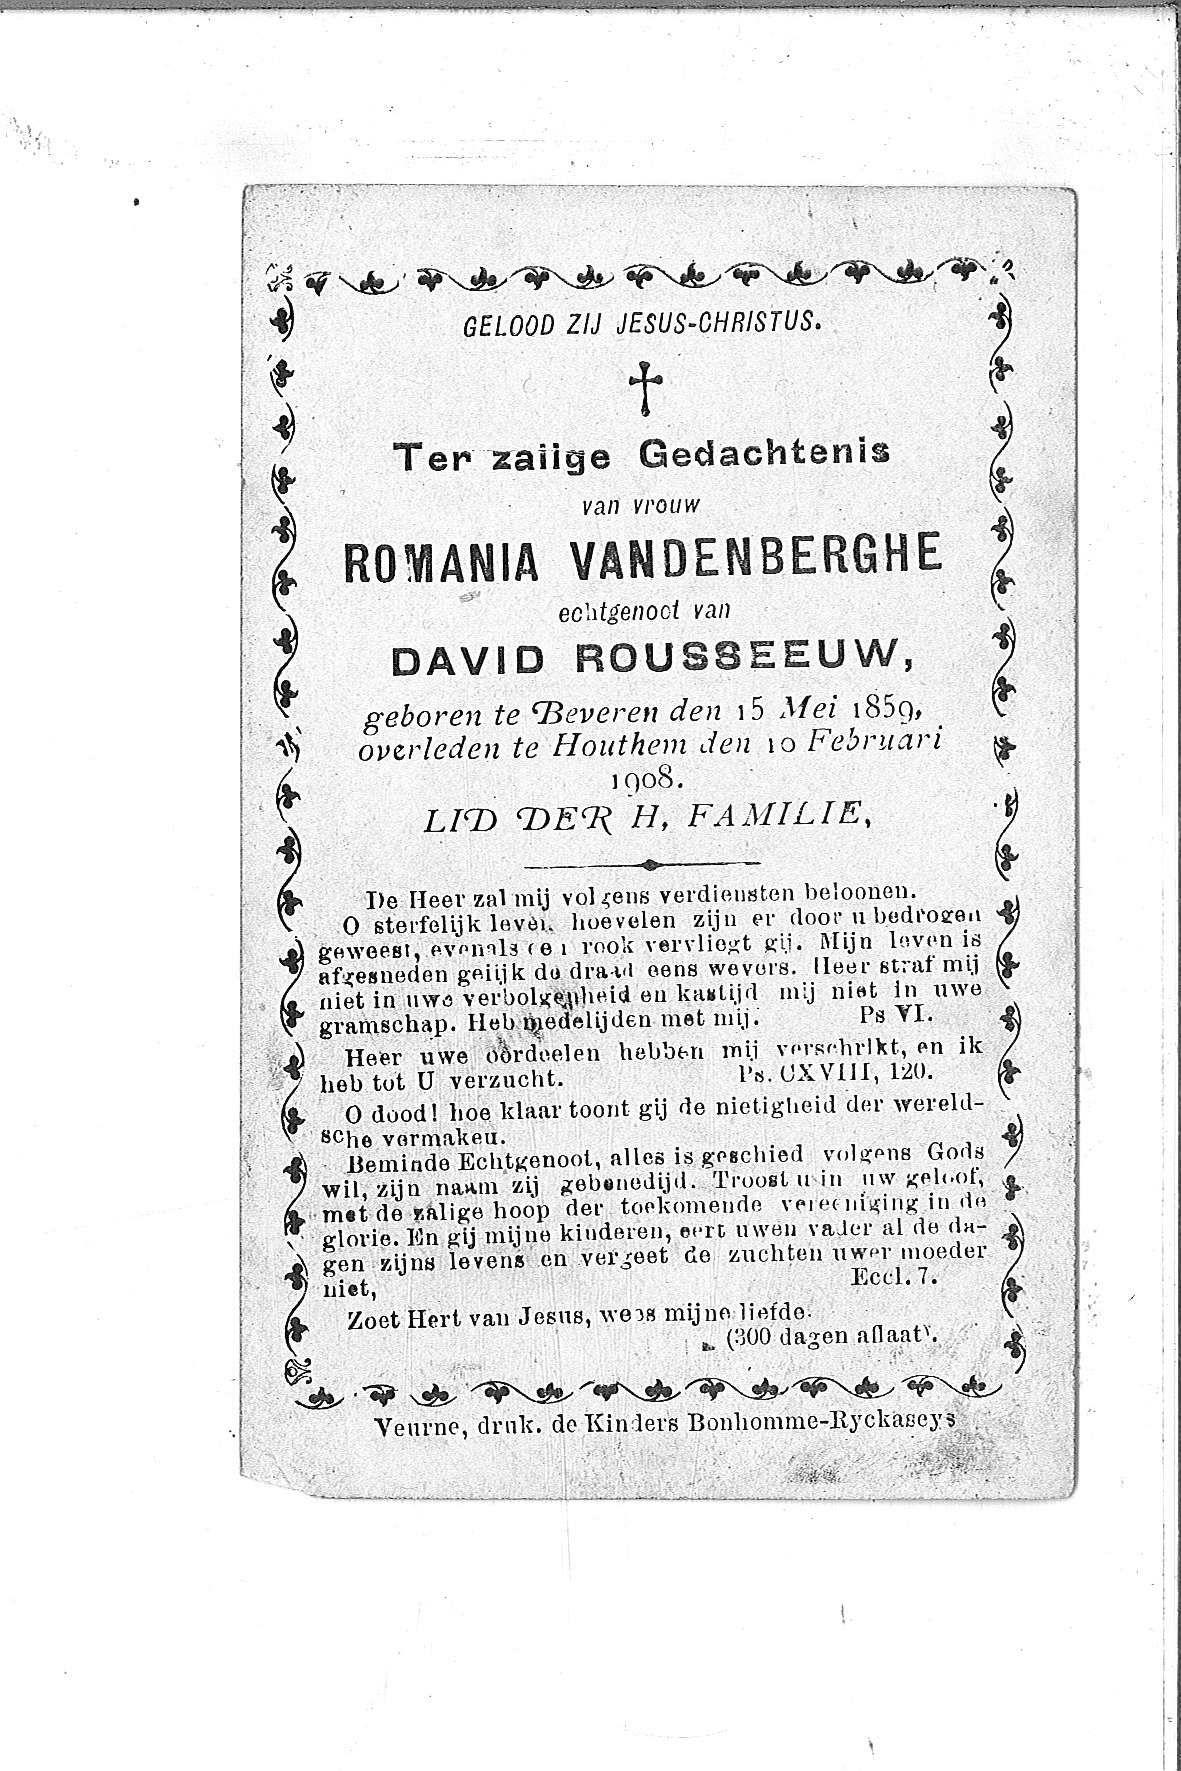 Romania(1908)20140722165159_00202.jpg